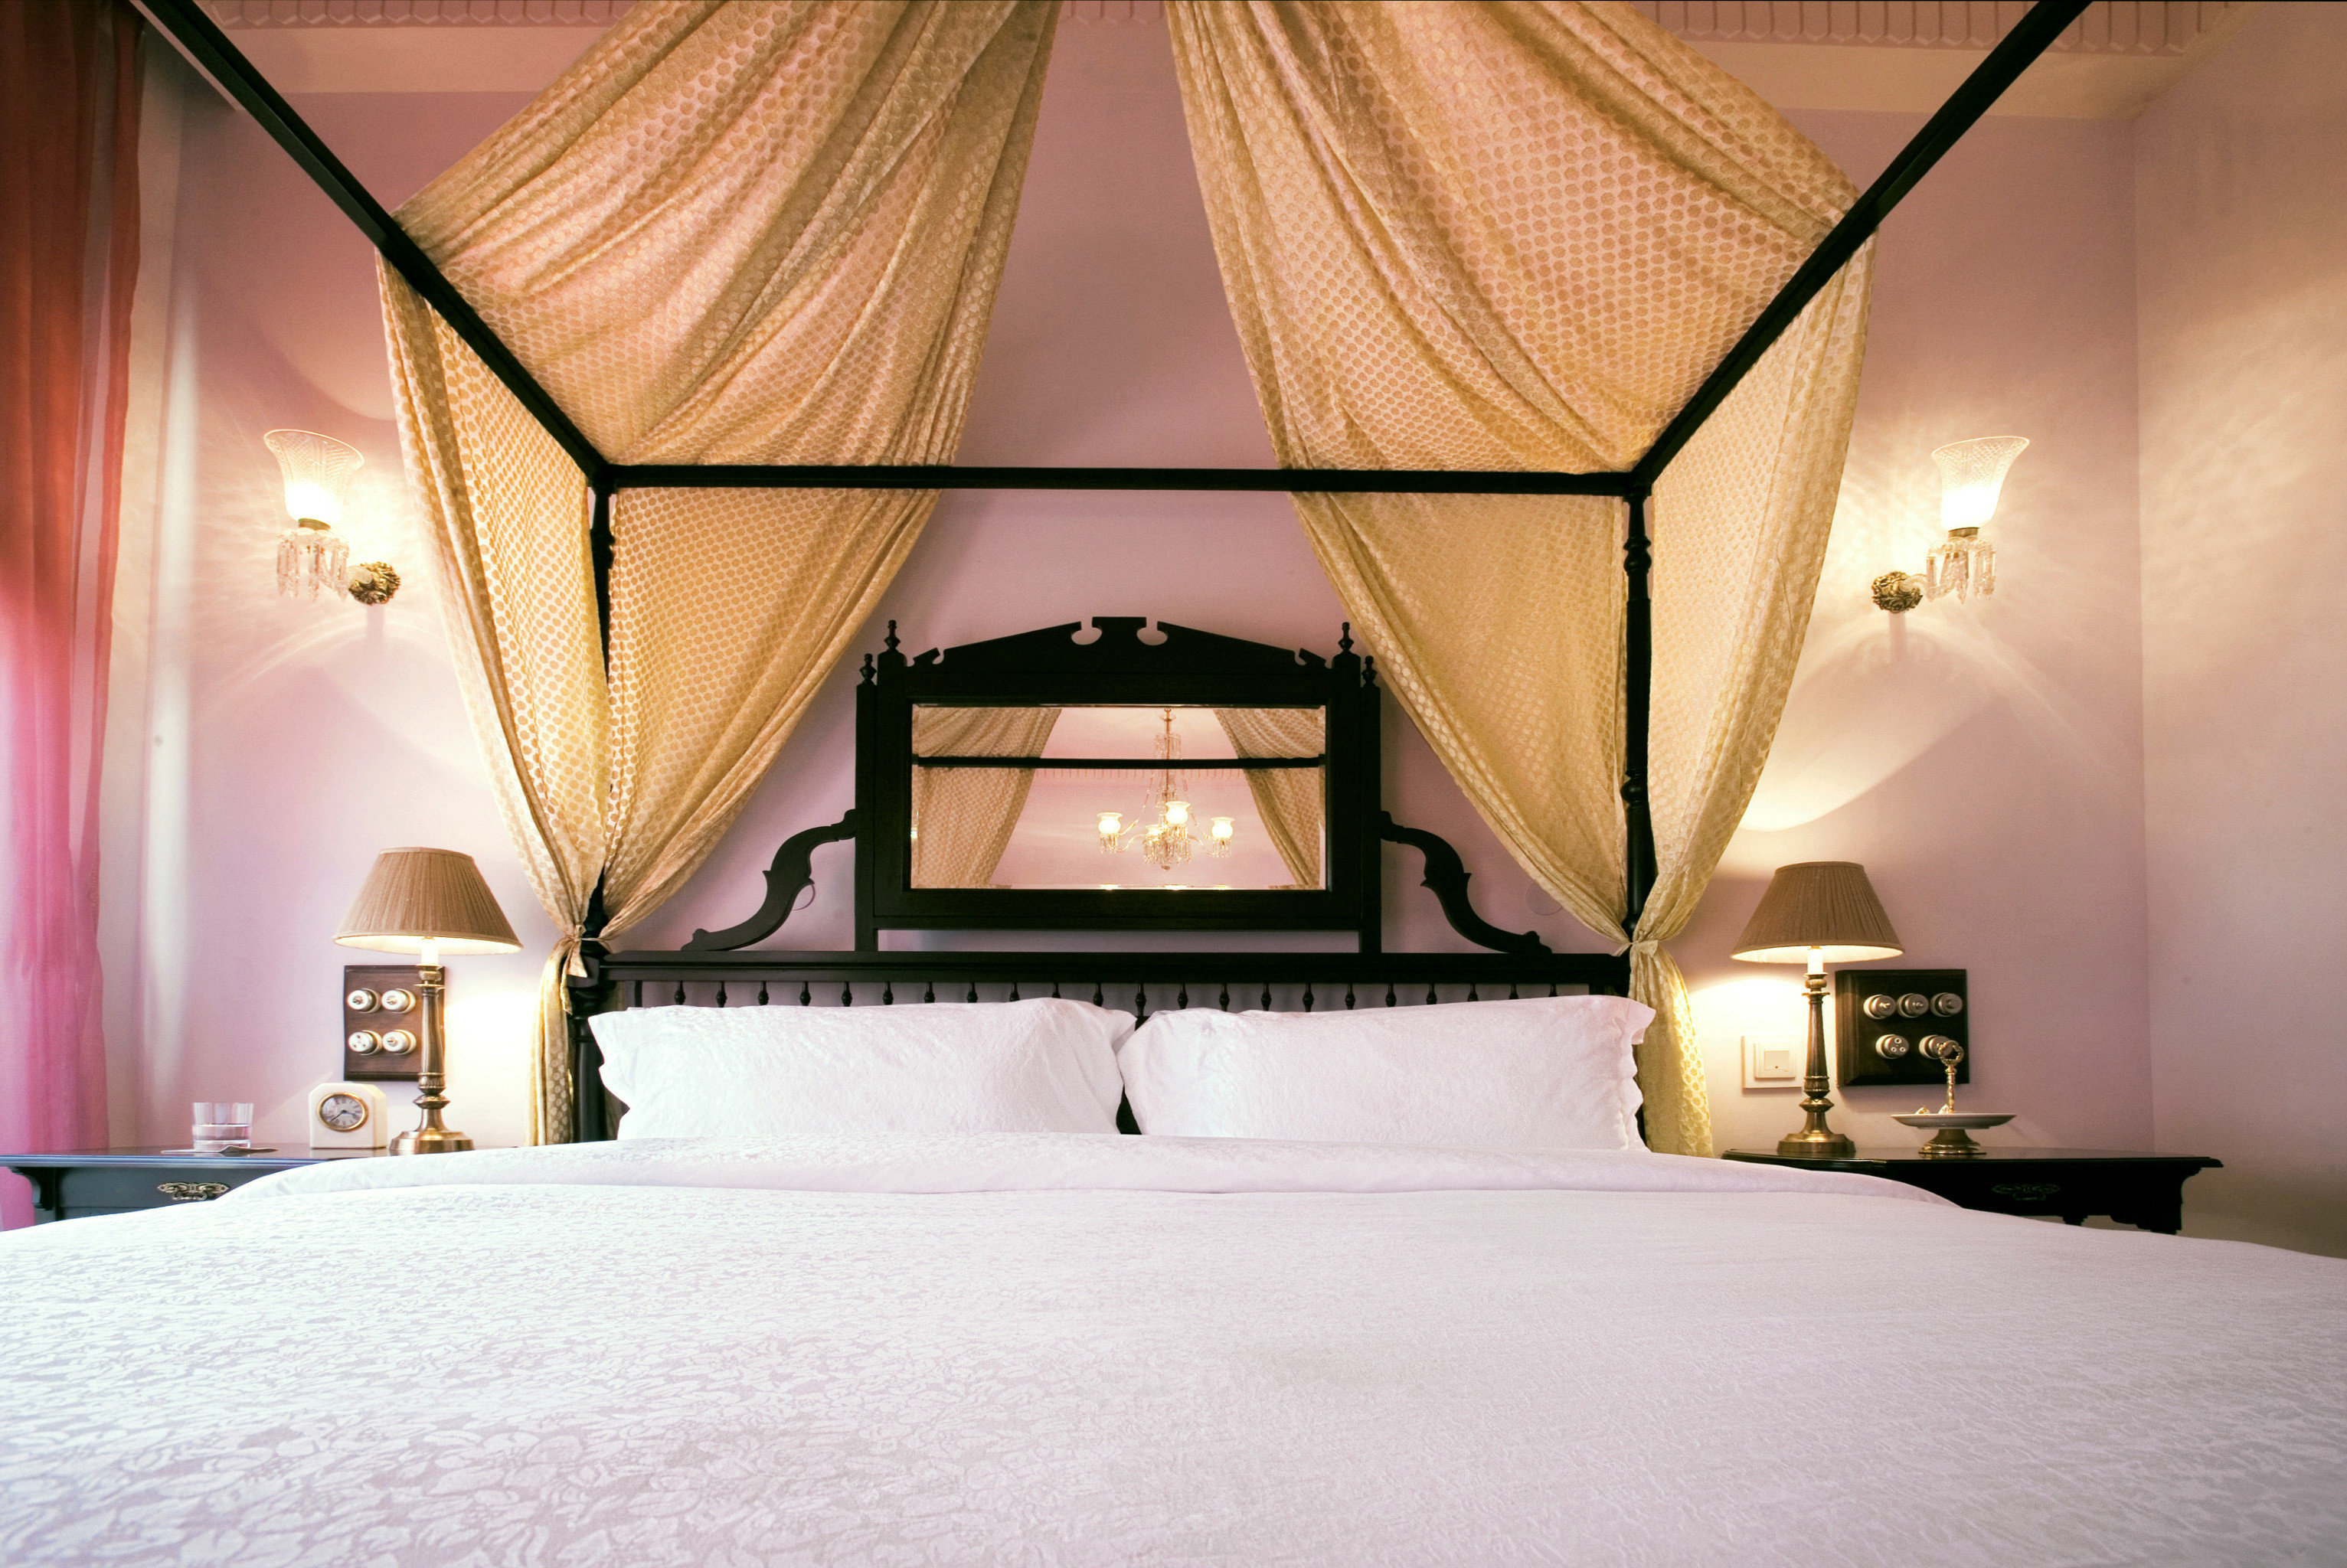 Bedroom Elegant Luxury Resort color house light Architecture home lighting lamp